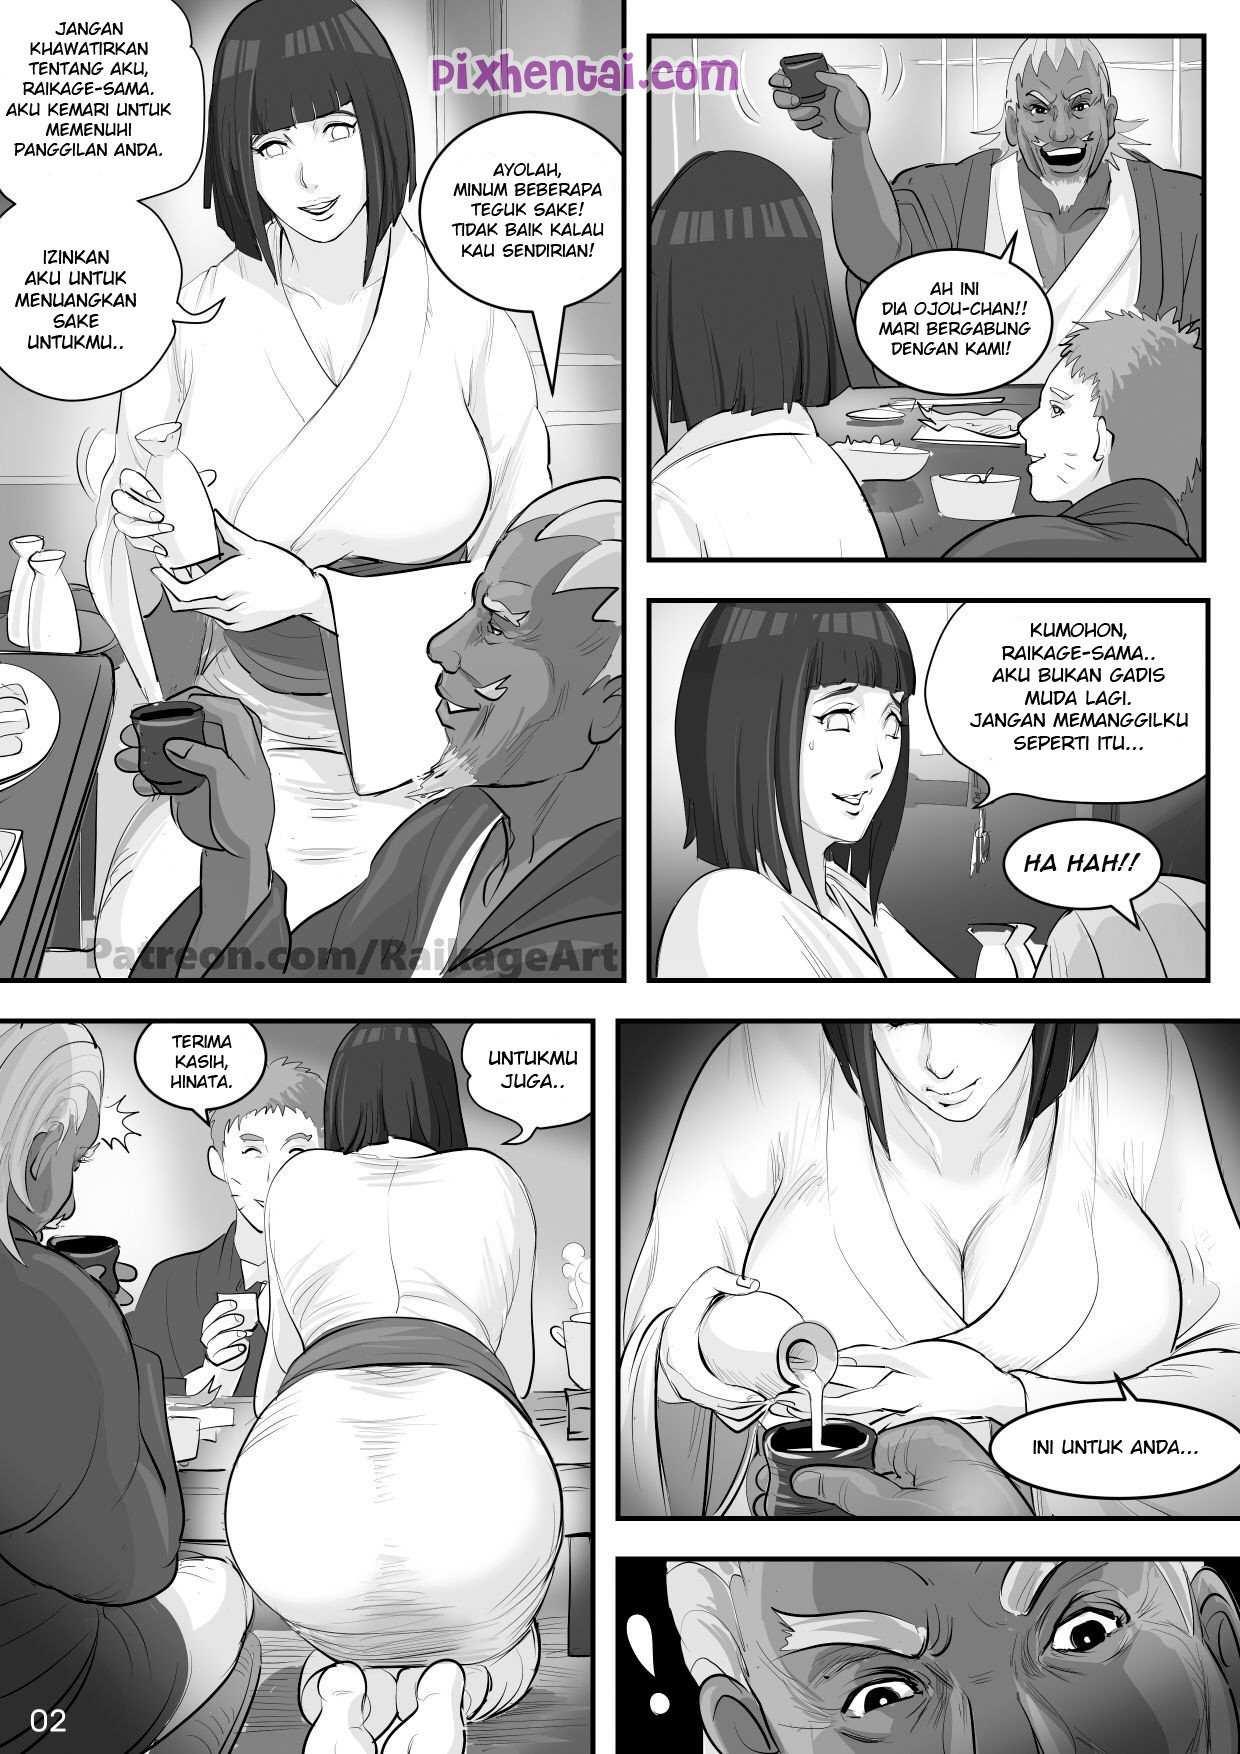 Komik hentai xxx manga sex bokep hinata dientot penis besar raikage 05